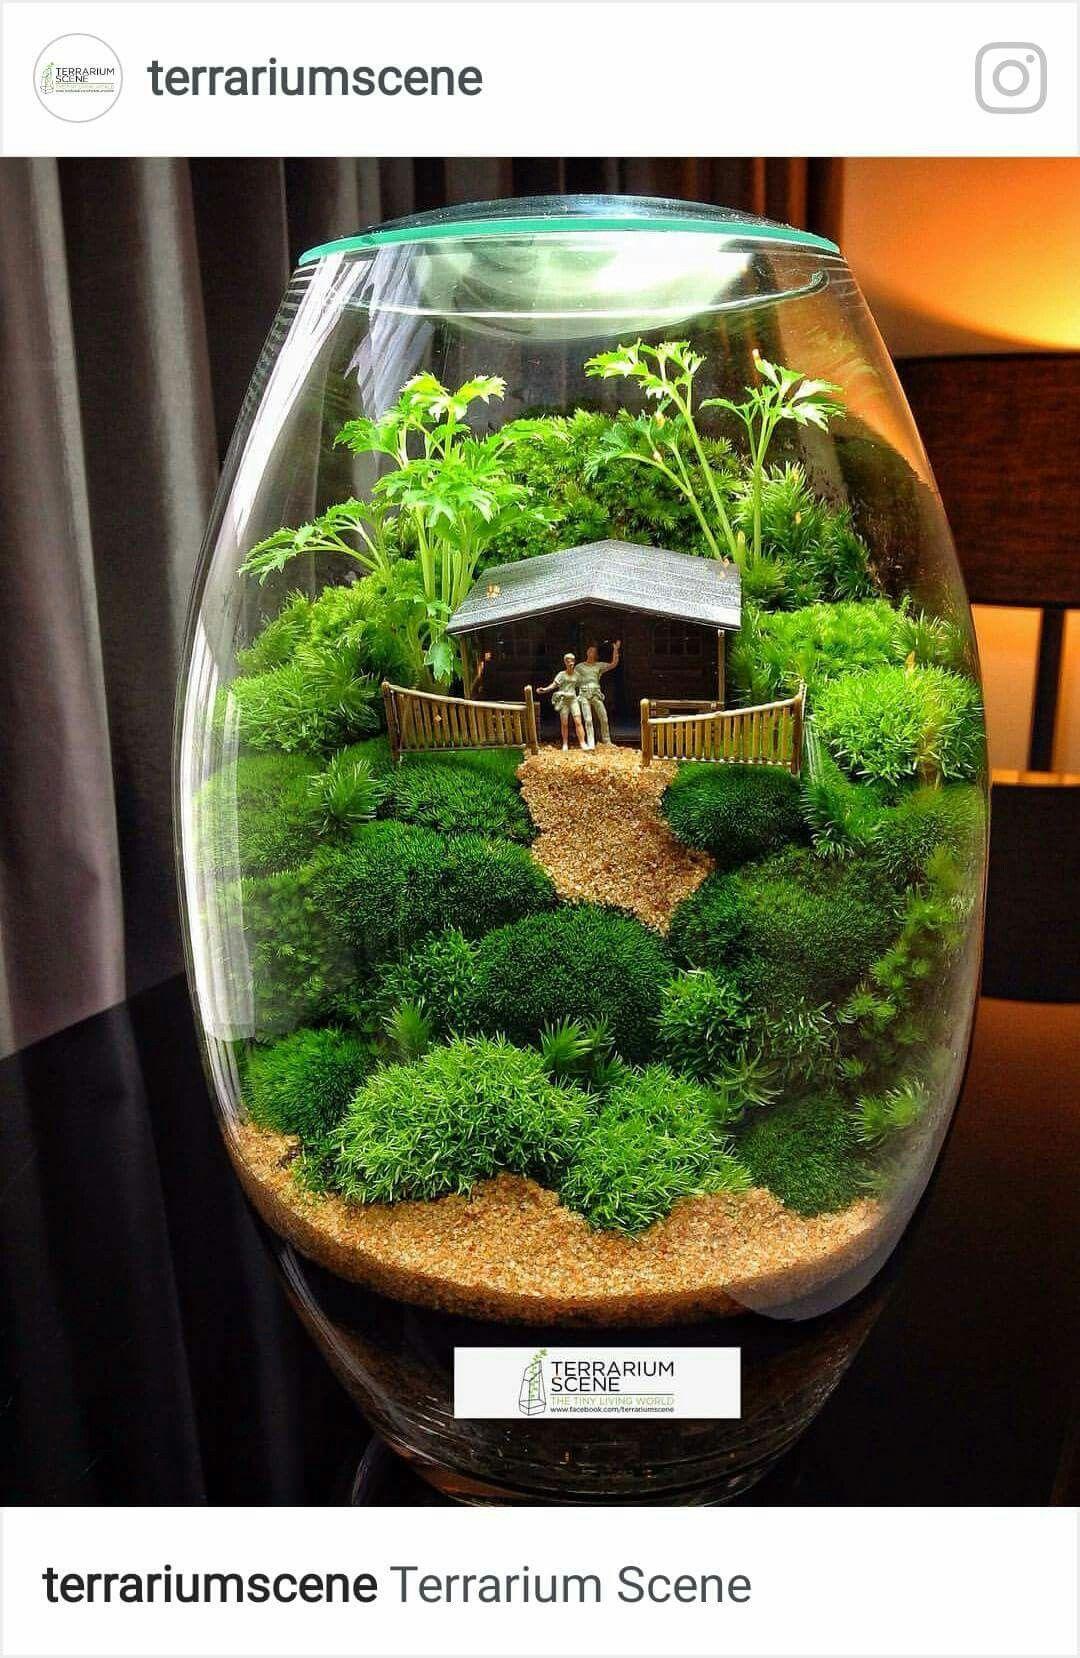 micro scenery as a terrarium fairies garden pinterest mini garten pflanzen und glas. Black Bedroom Furniture Sets. Home Design Ideas